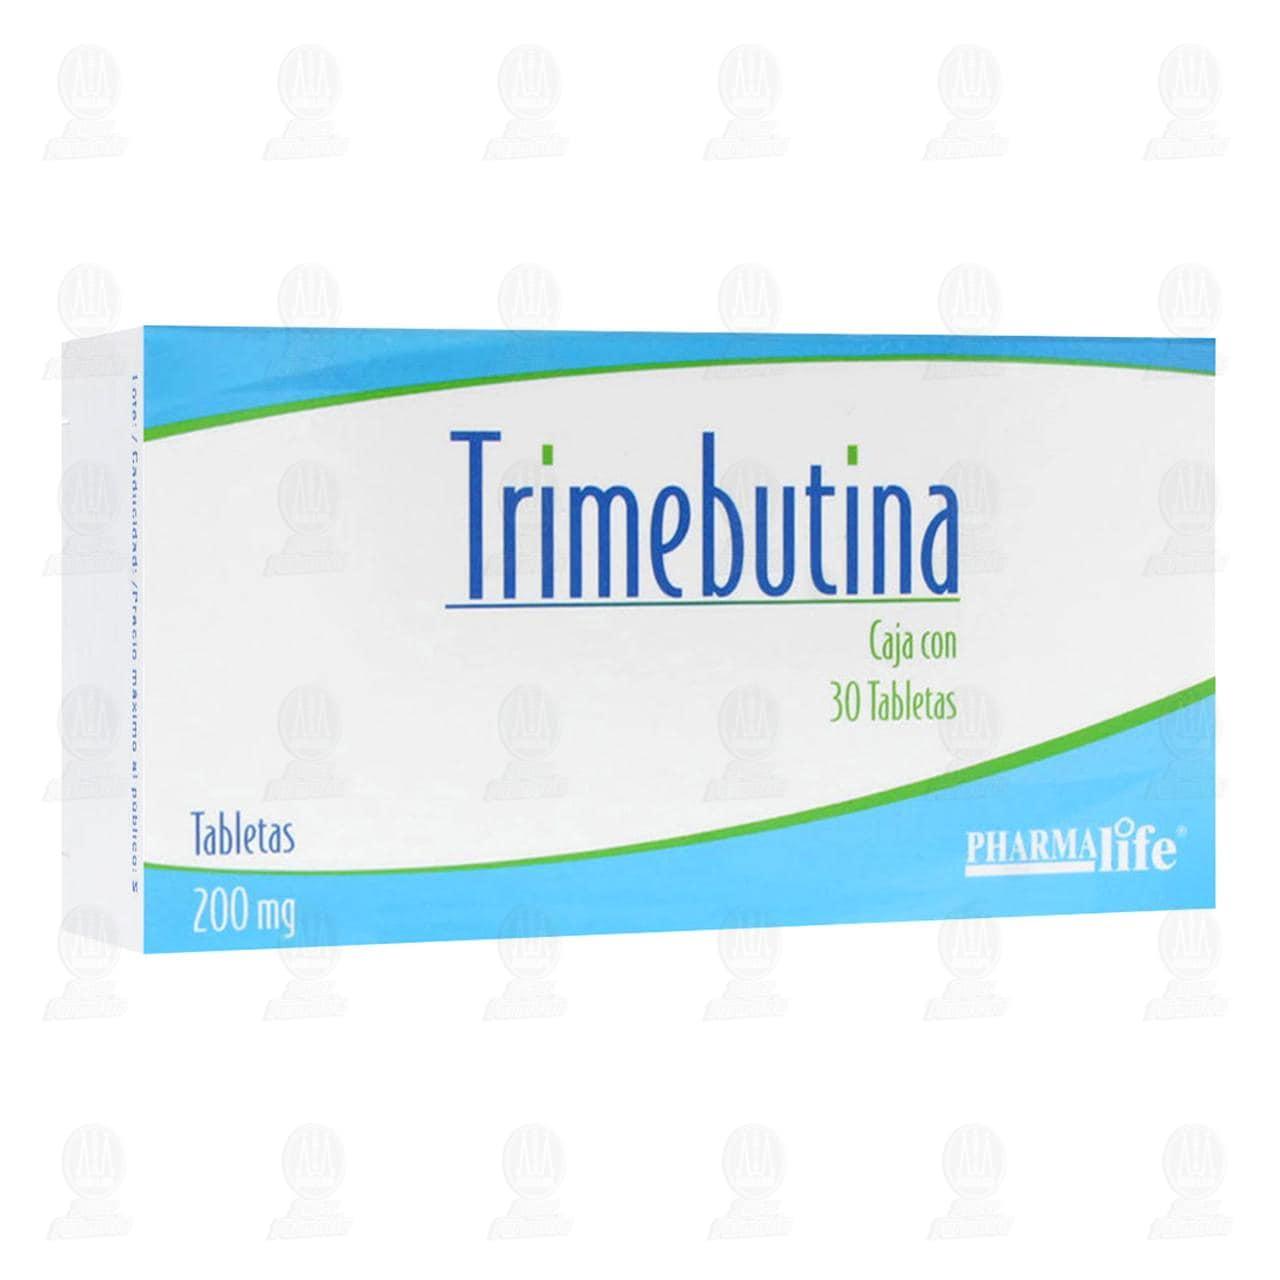 Trimebutina 200mg 30 Tabletas Pharmalife